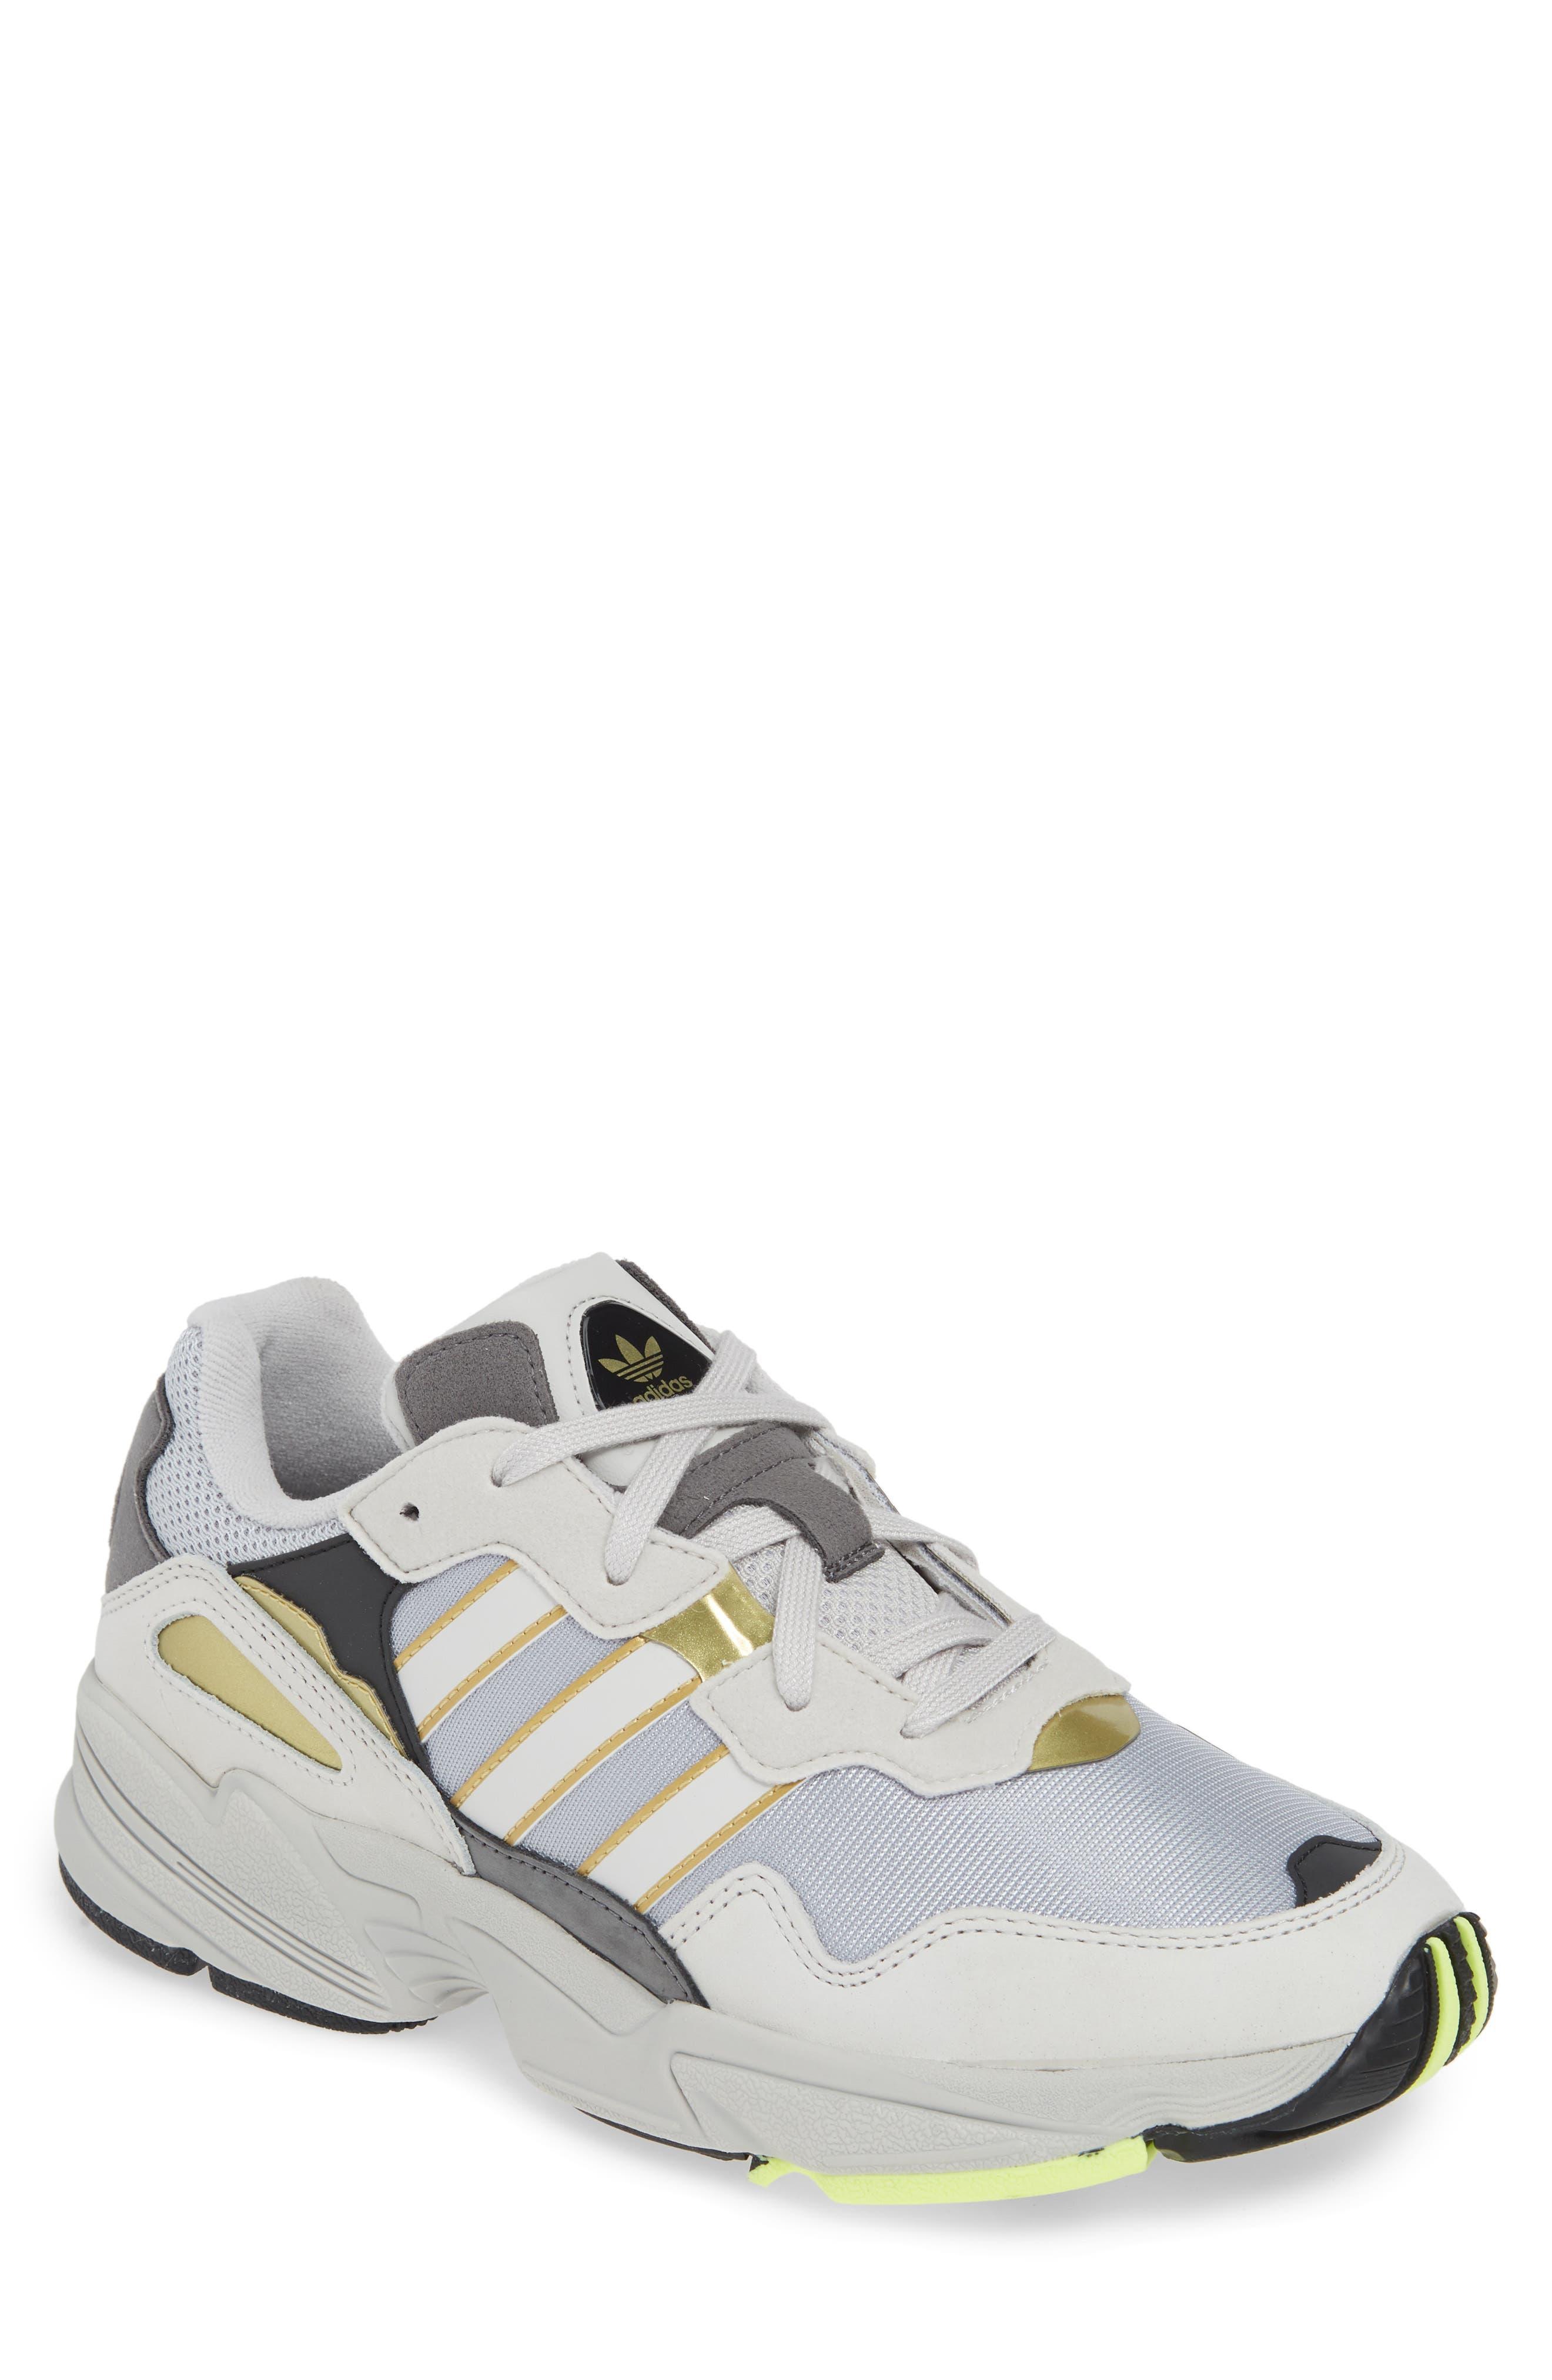 Adidas Yung 96 Sneaker, Grey